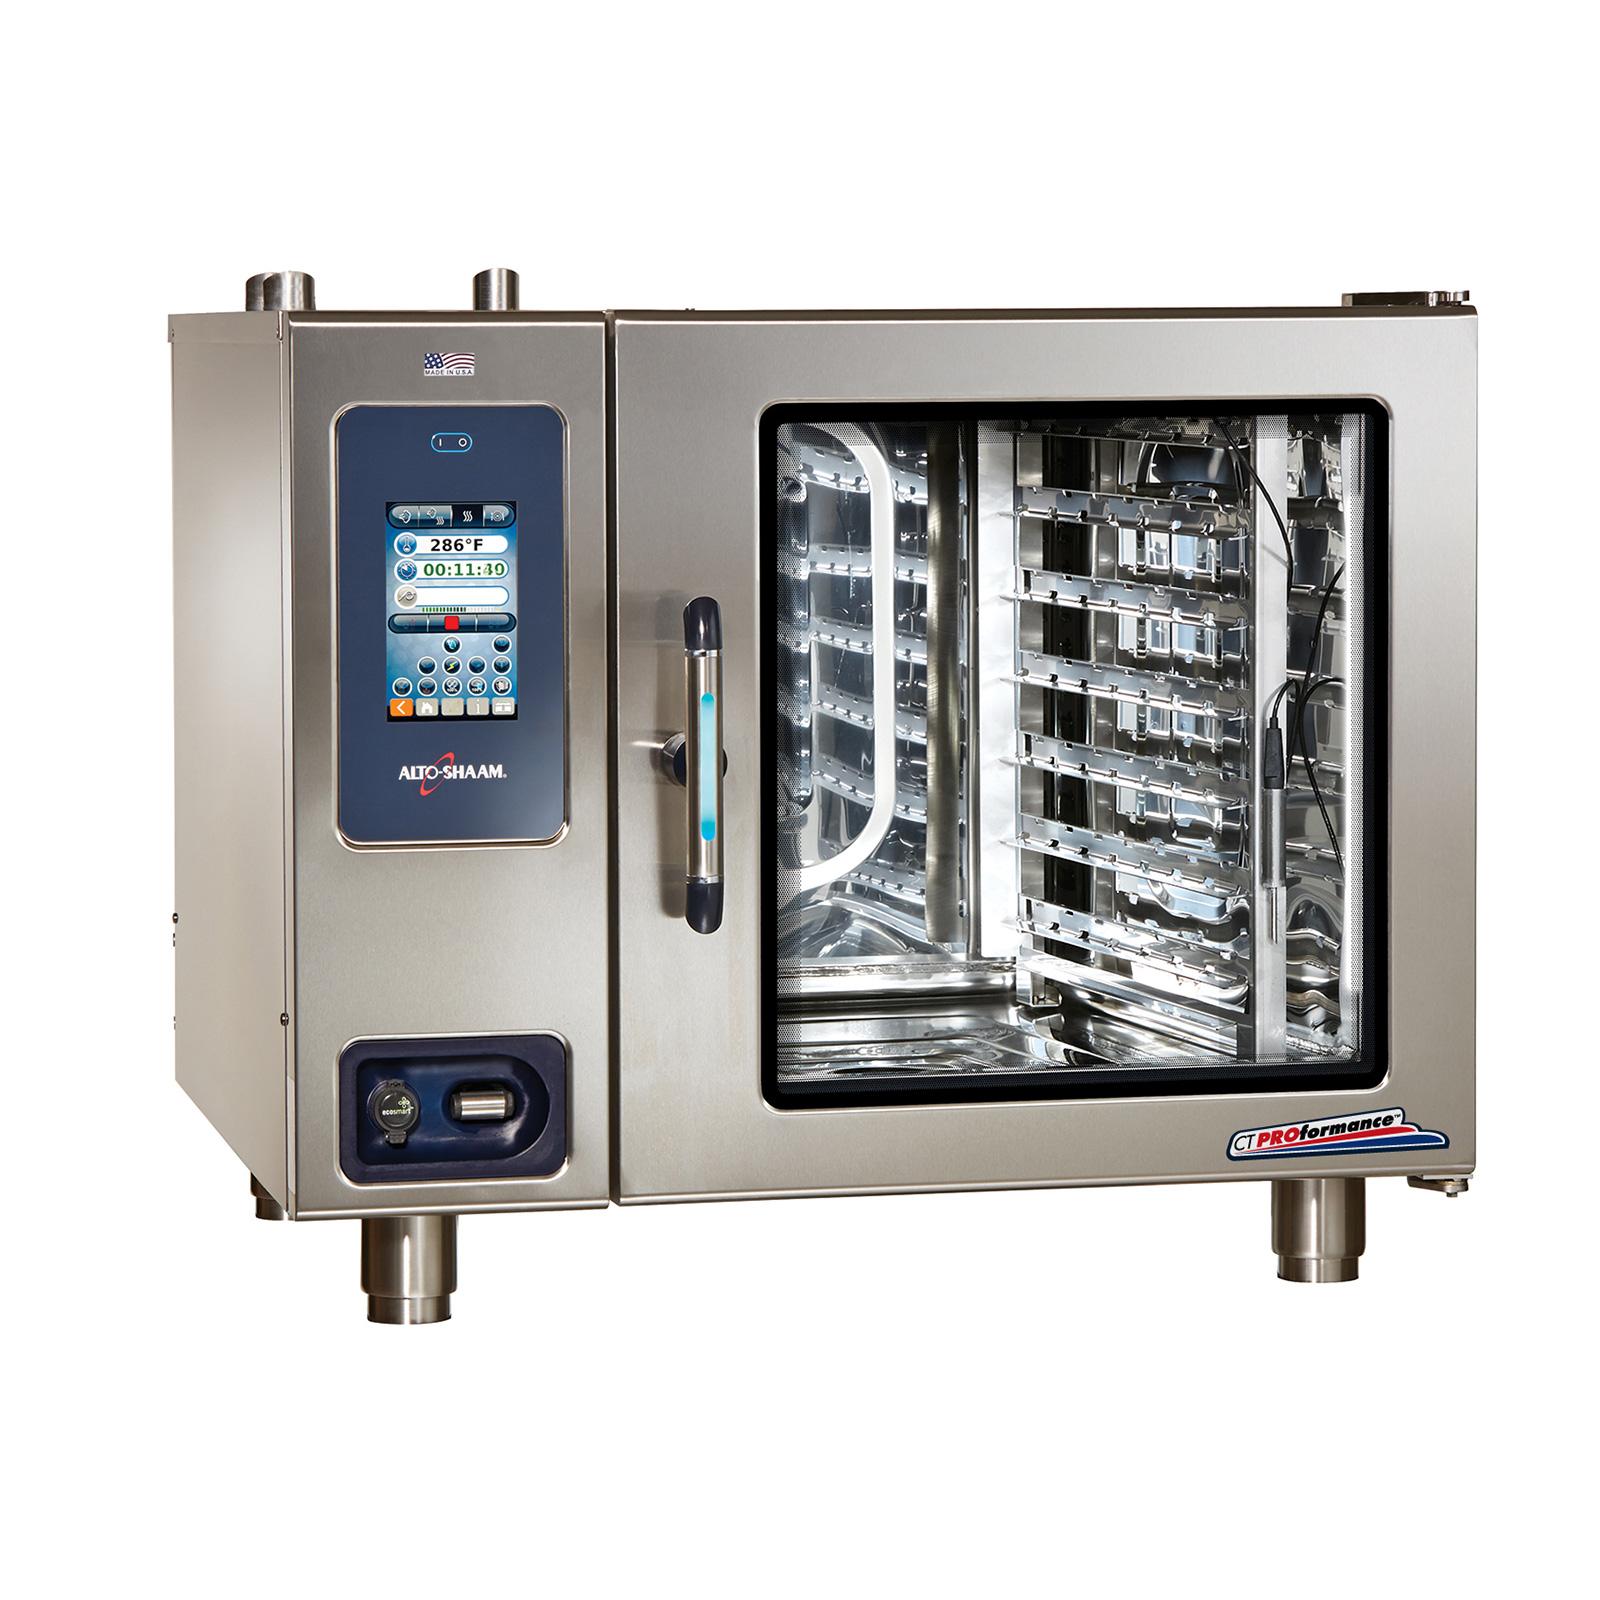 Alto-Shaam CTP7-20E-QS combi oven, electric